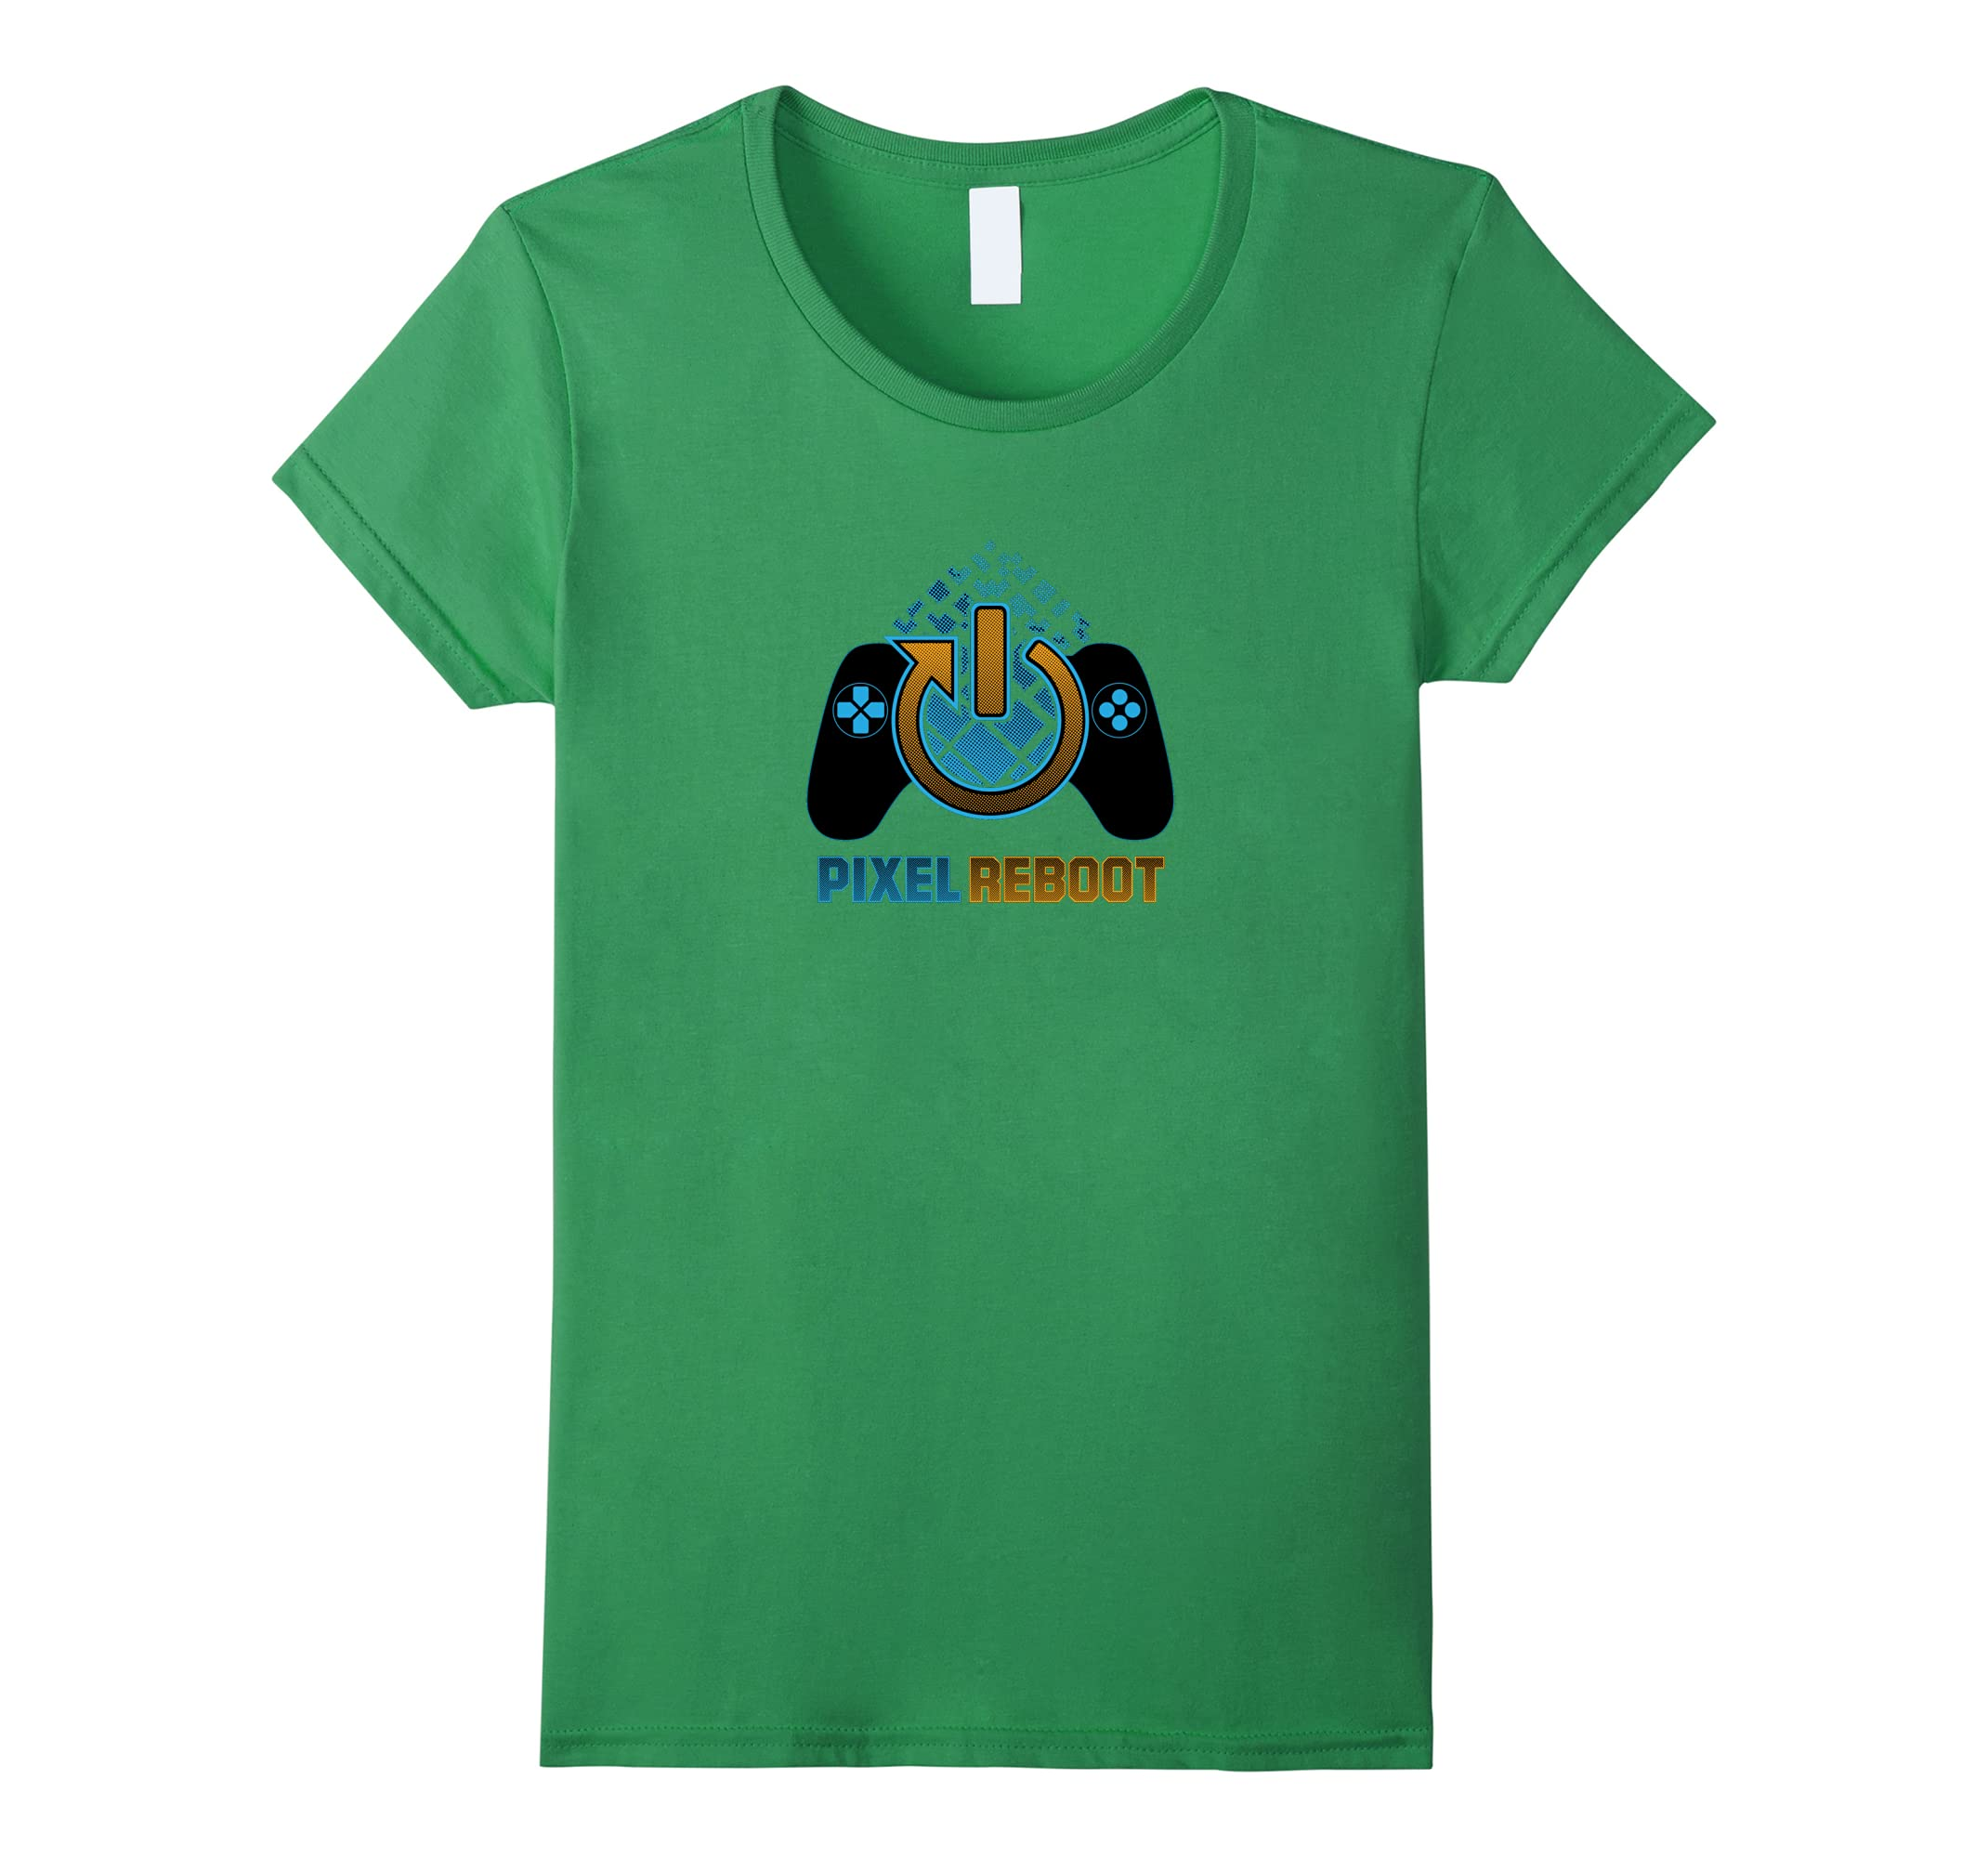 The Official Pixel Reboot Shirt-Tovacu